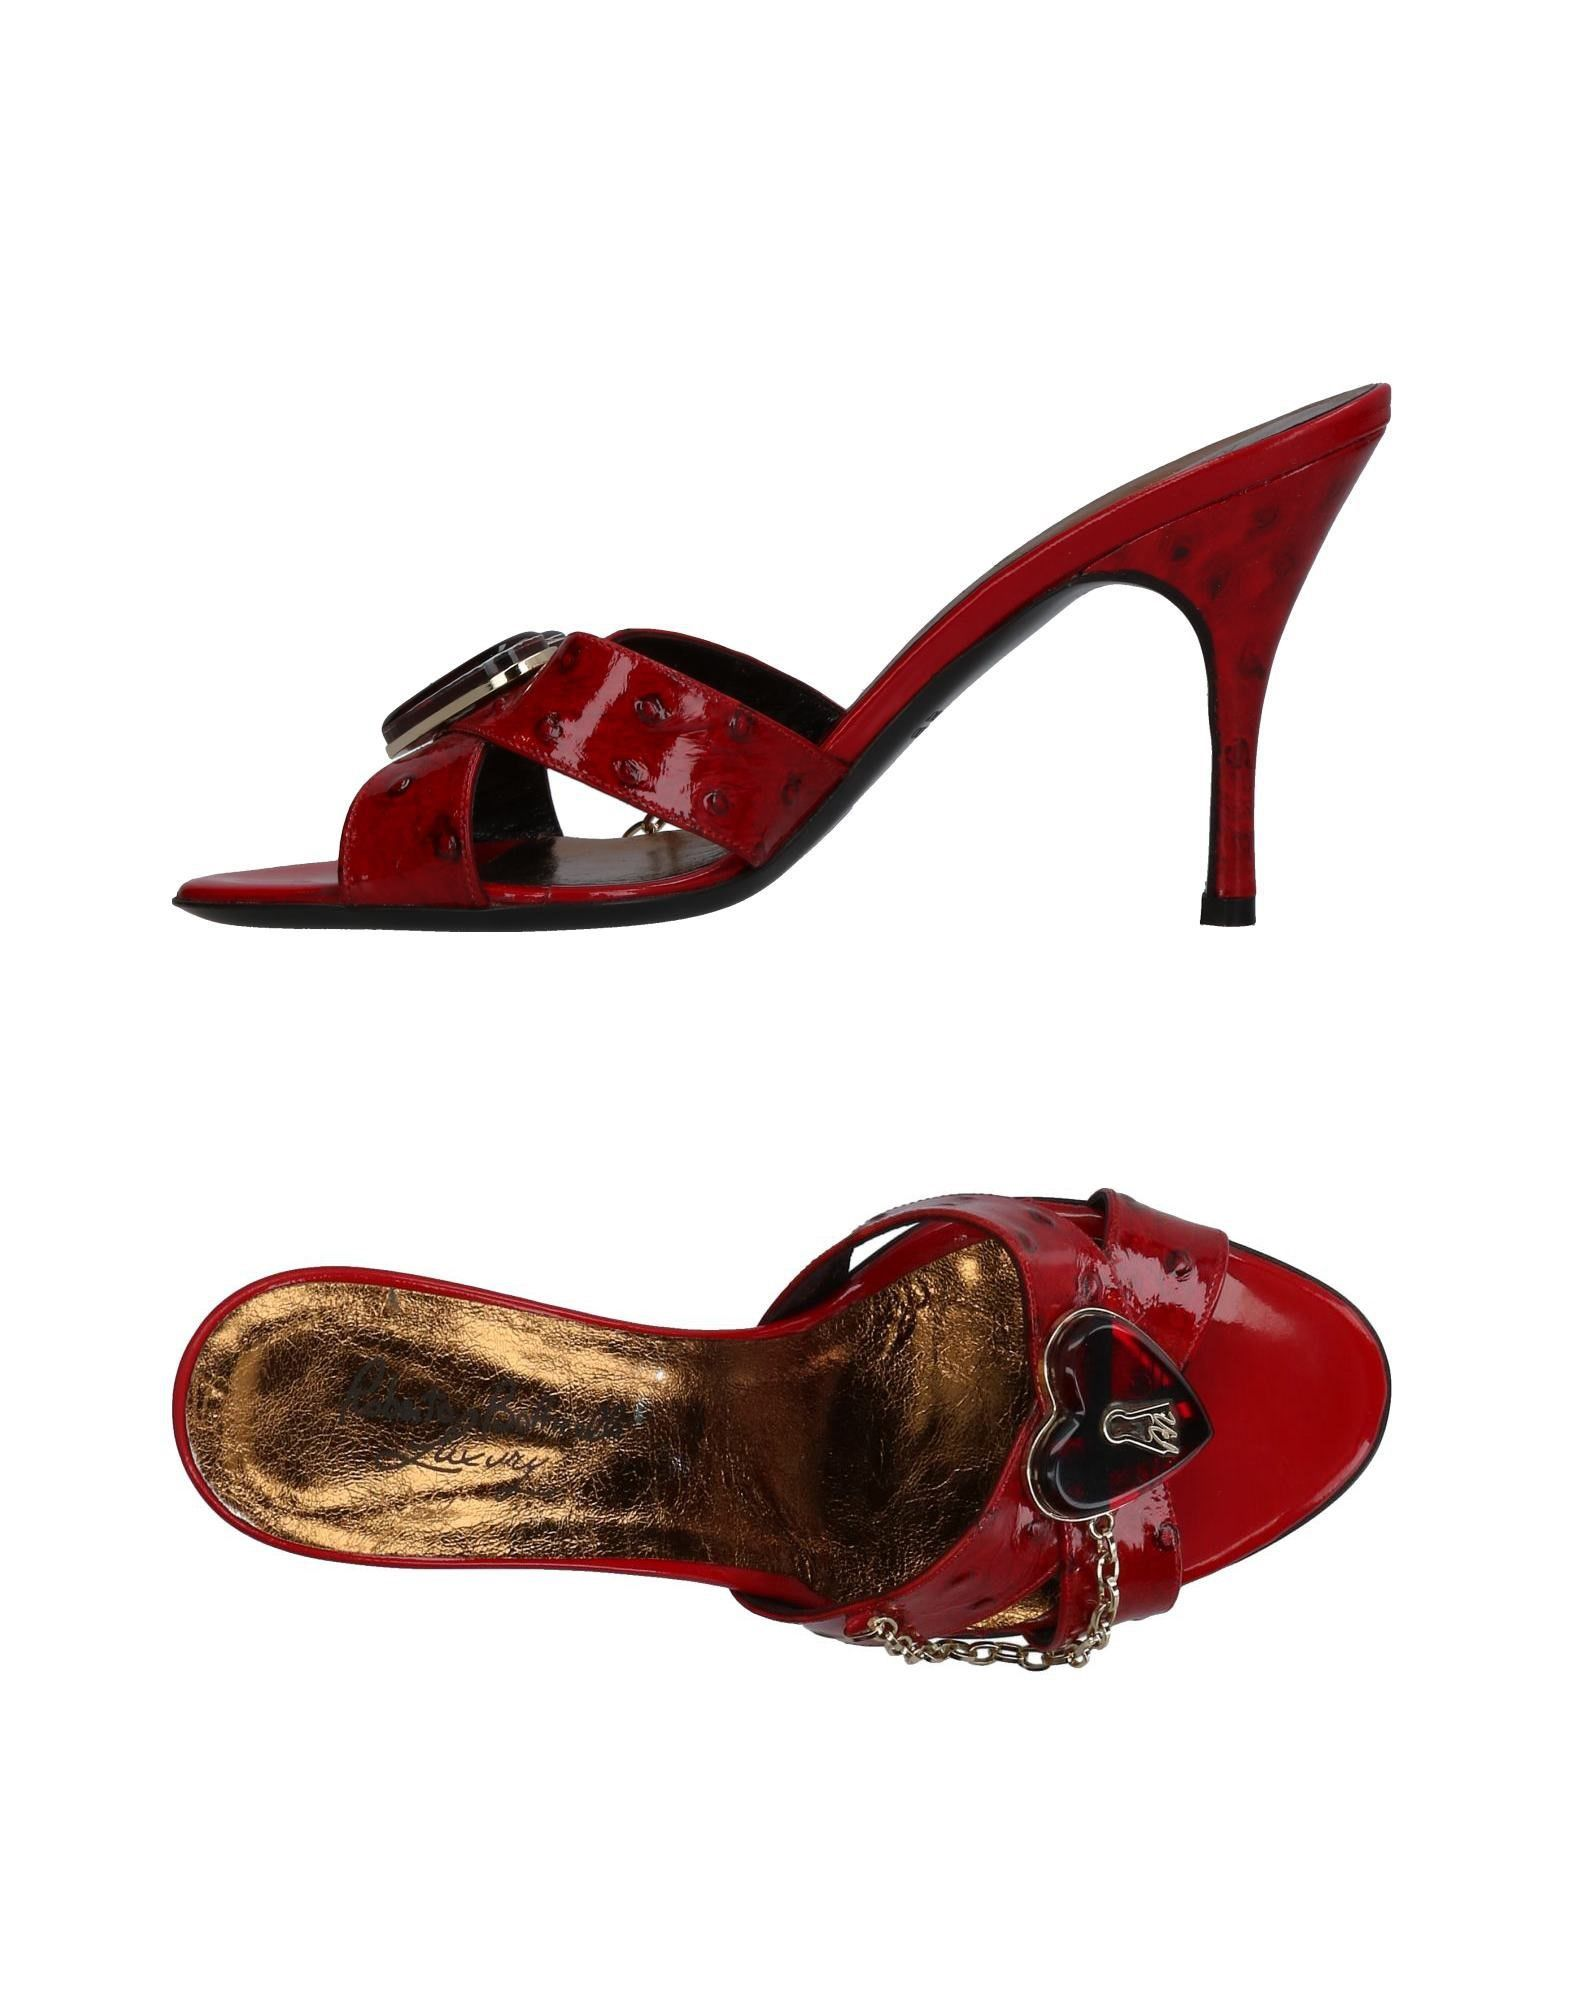 Chaussures - Sandales Post Orteils Roberto Botticelli Ee6rH00z1